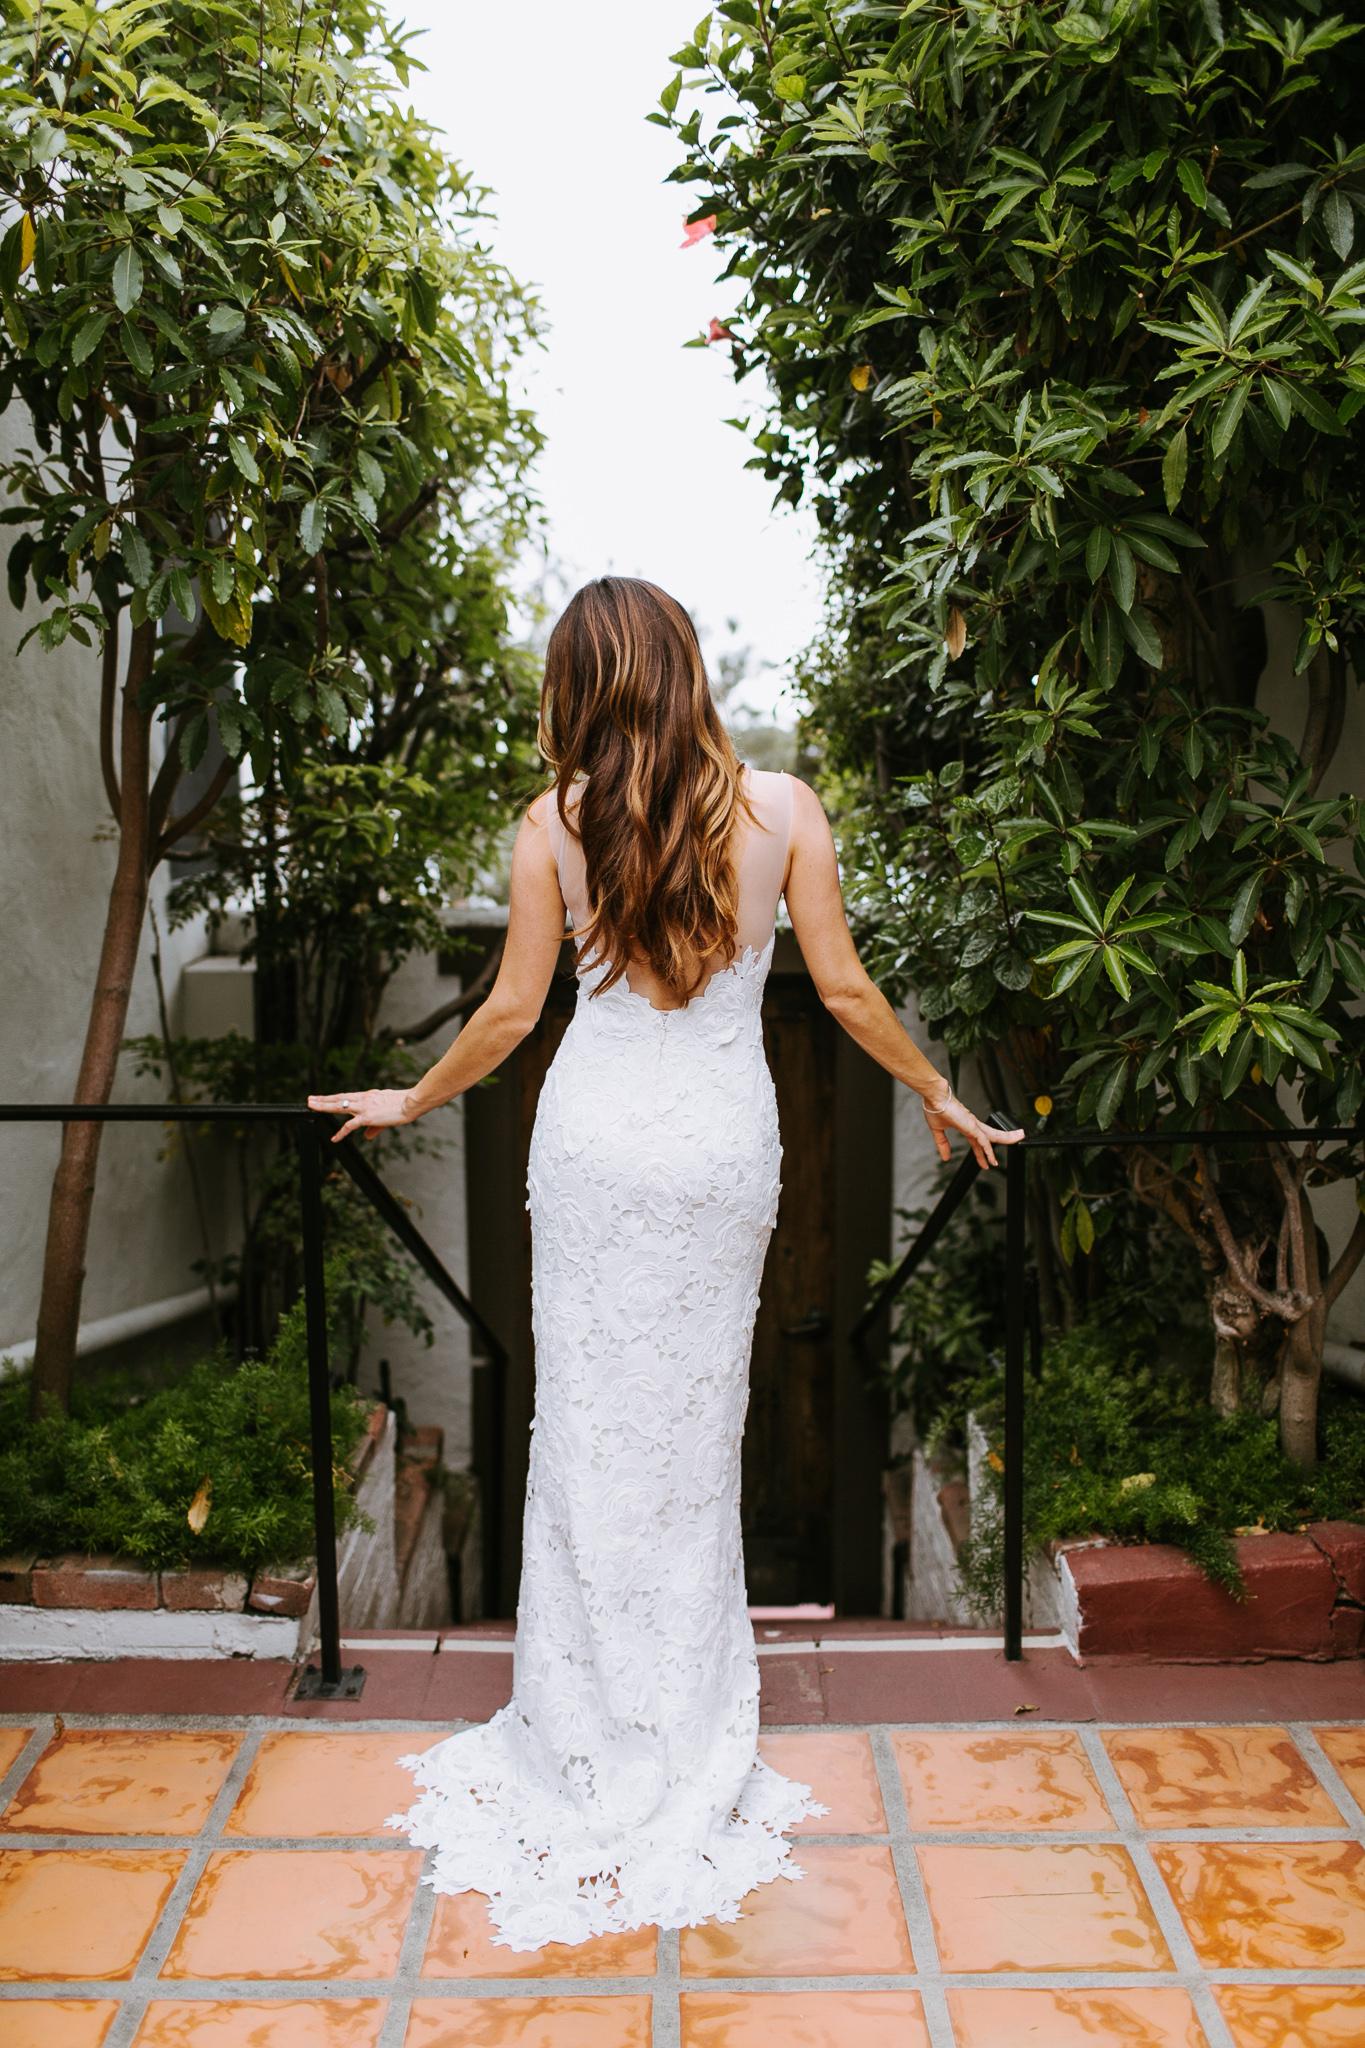 LagunaBeach-WeddingPhotographer-14.jpg